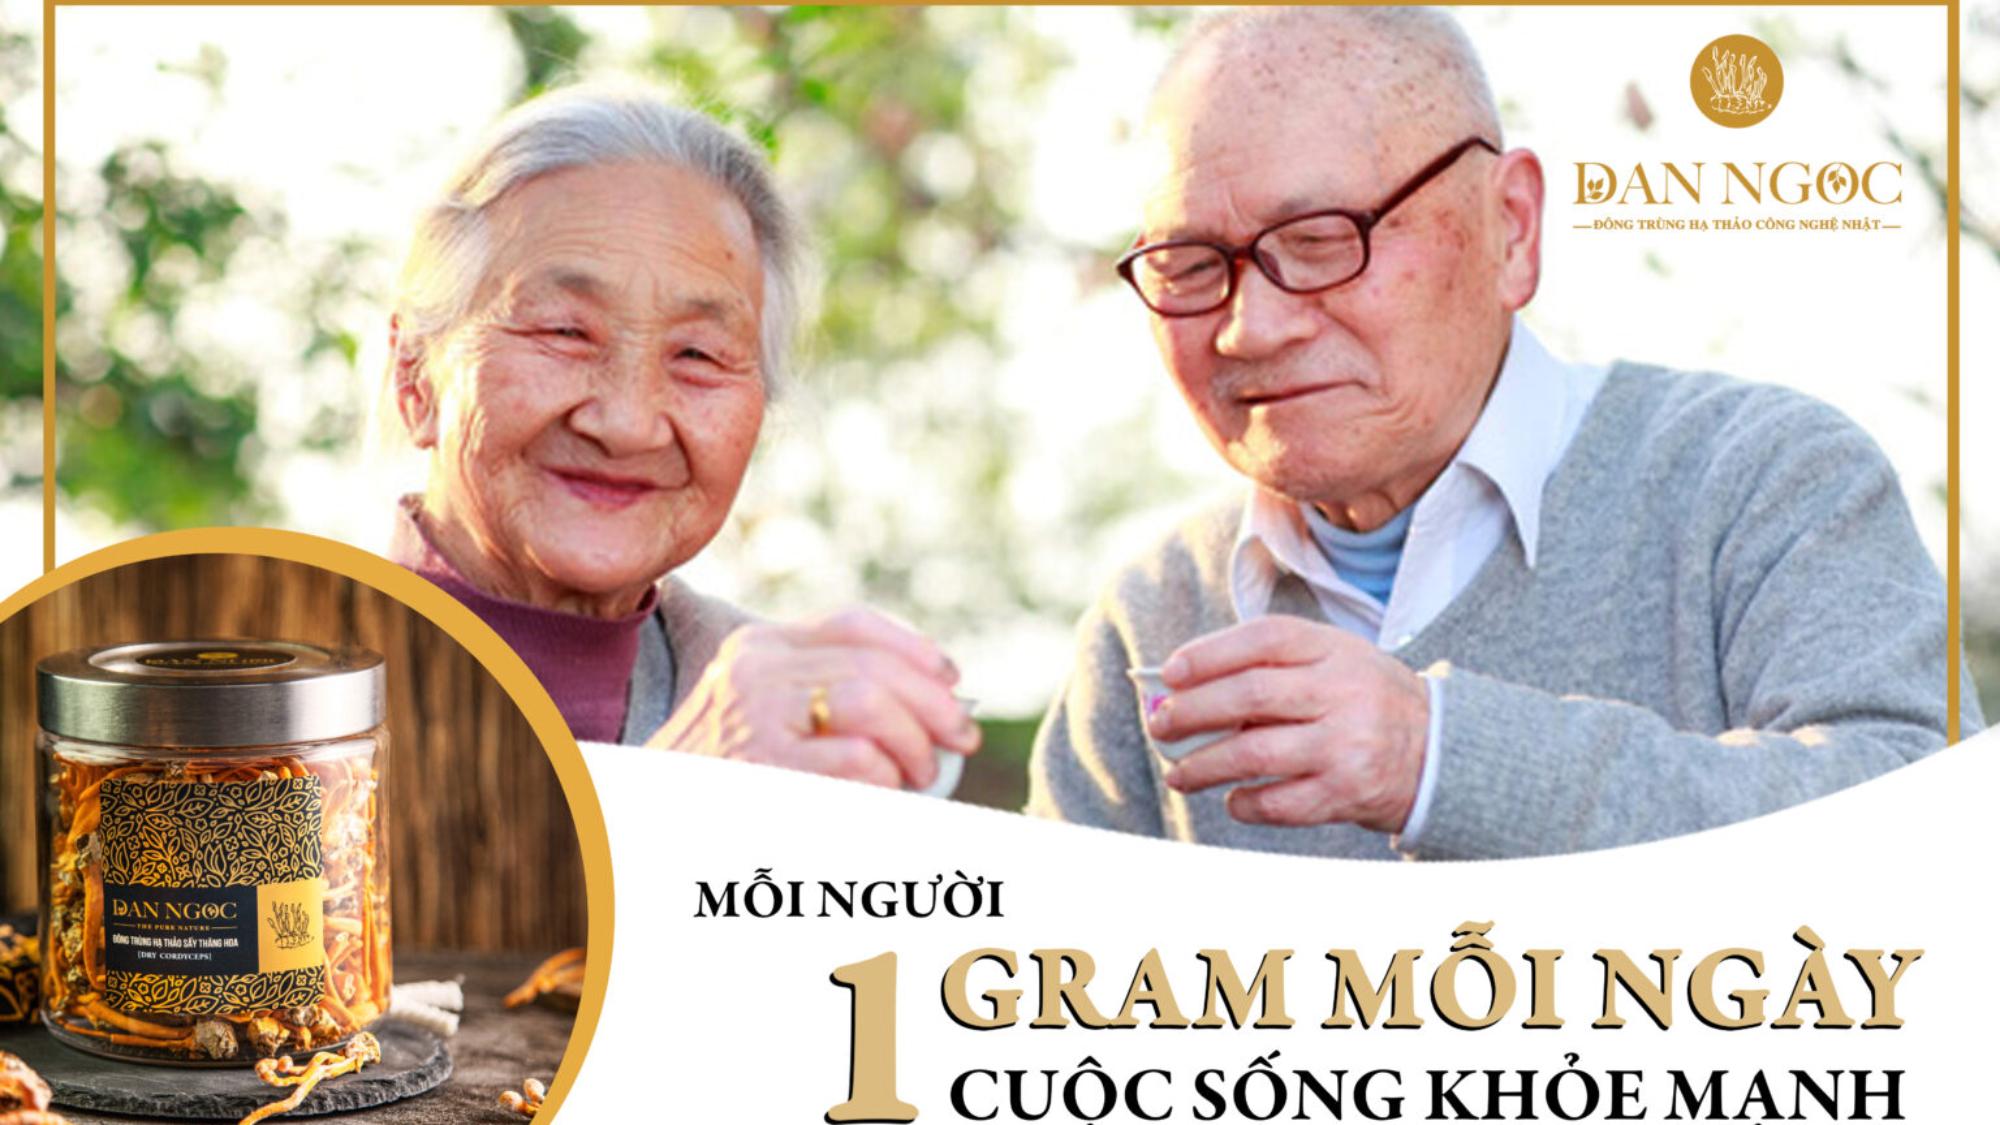 tac-dung-cua-dong-trung-ha-thao-1536x938